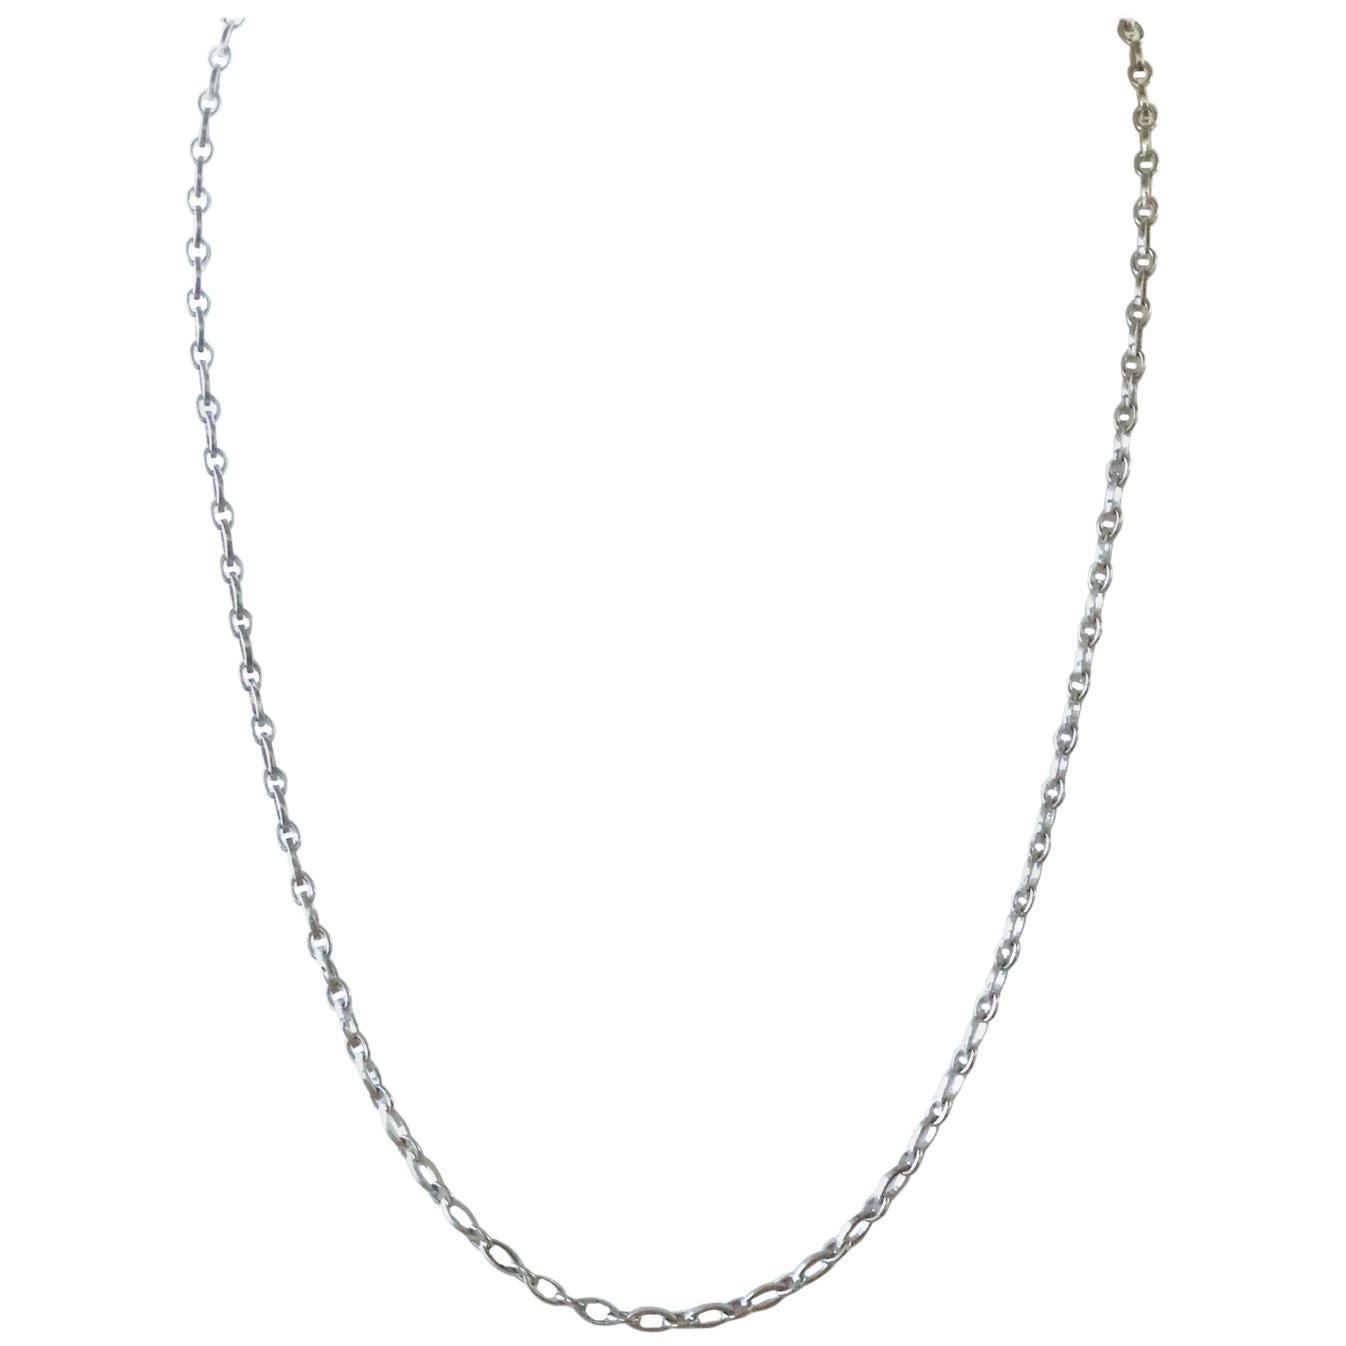 Mauboussin 18 Karat White Gold Necklace